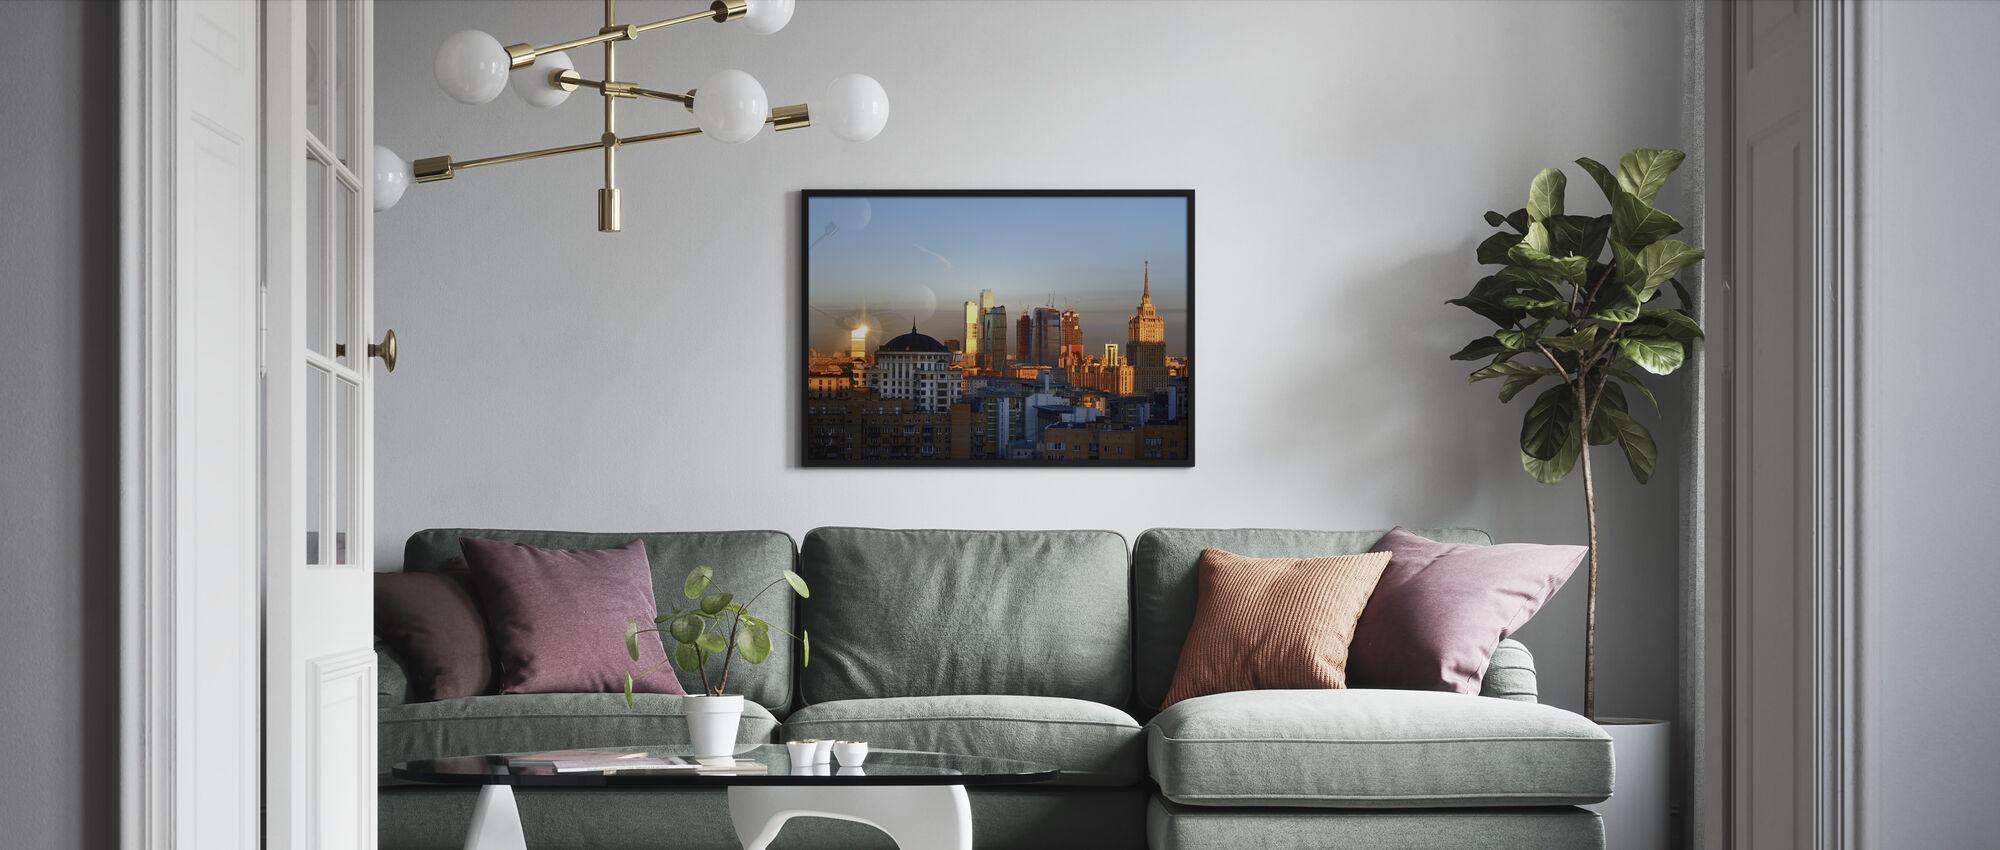 Moscow Skyline at Sunrise - Framed print - Living Room